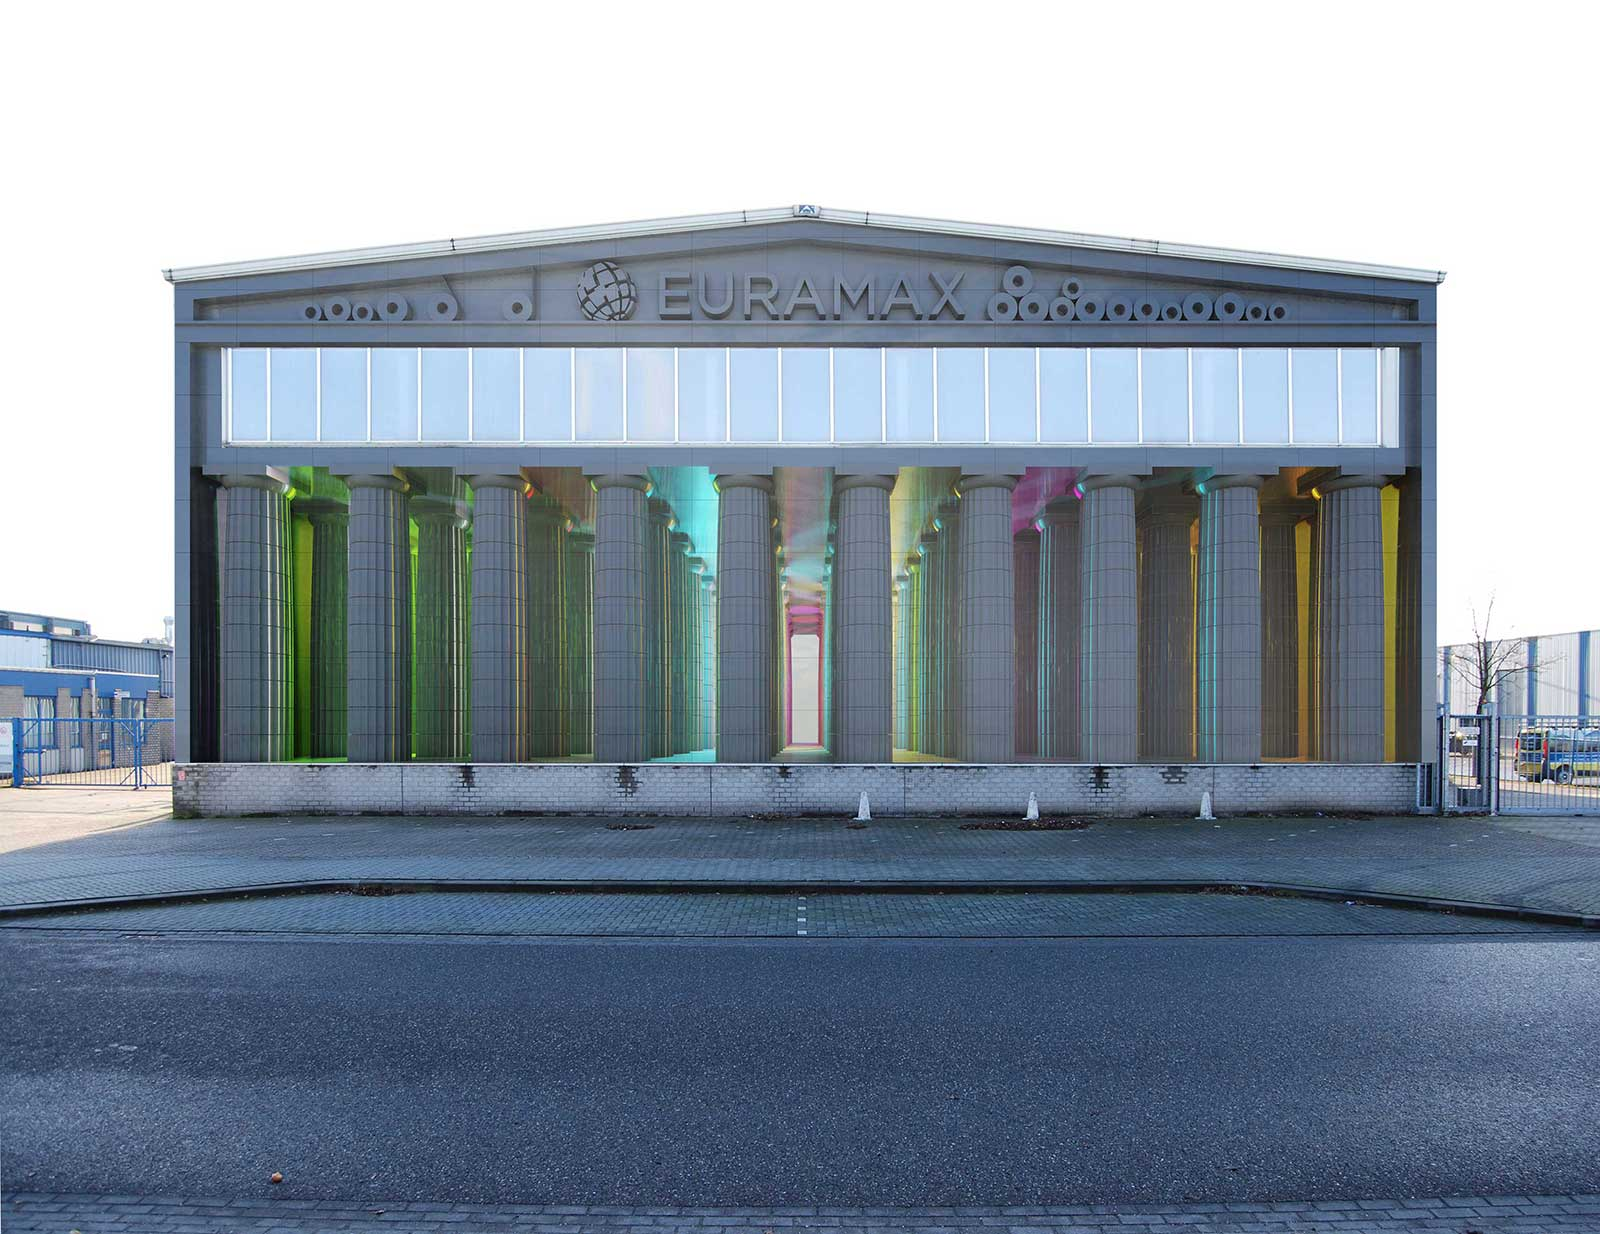 Proposed facade of the Euramax factory